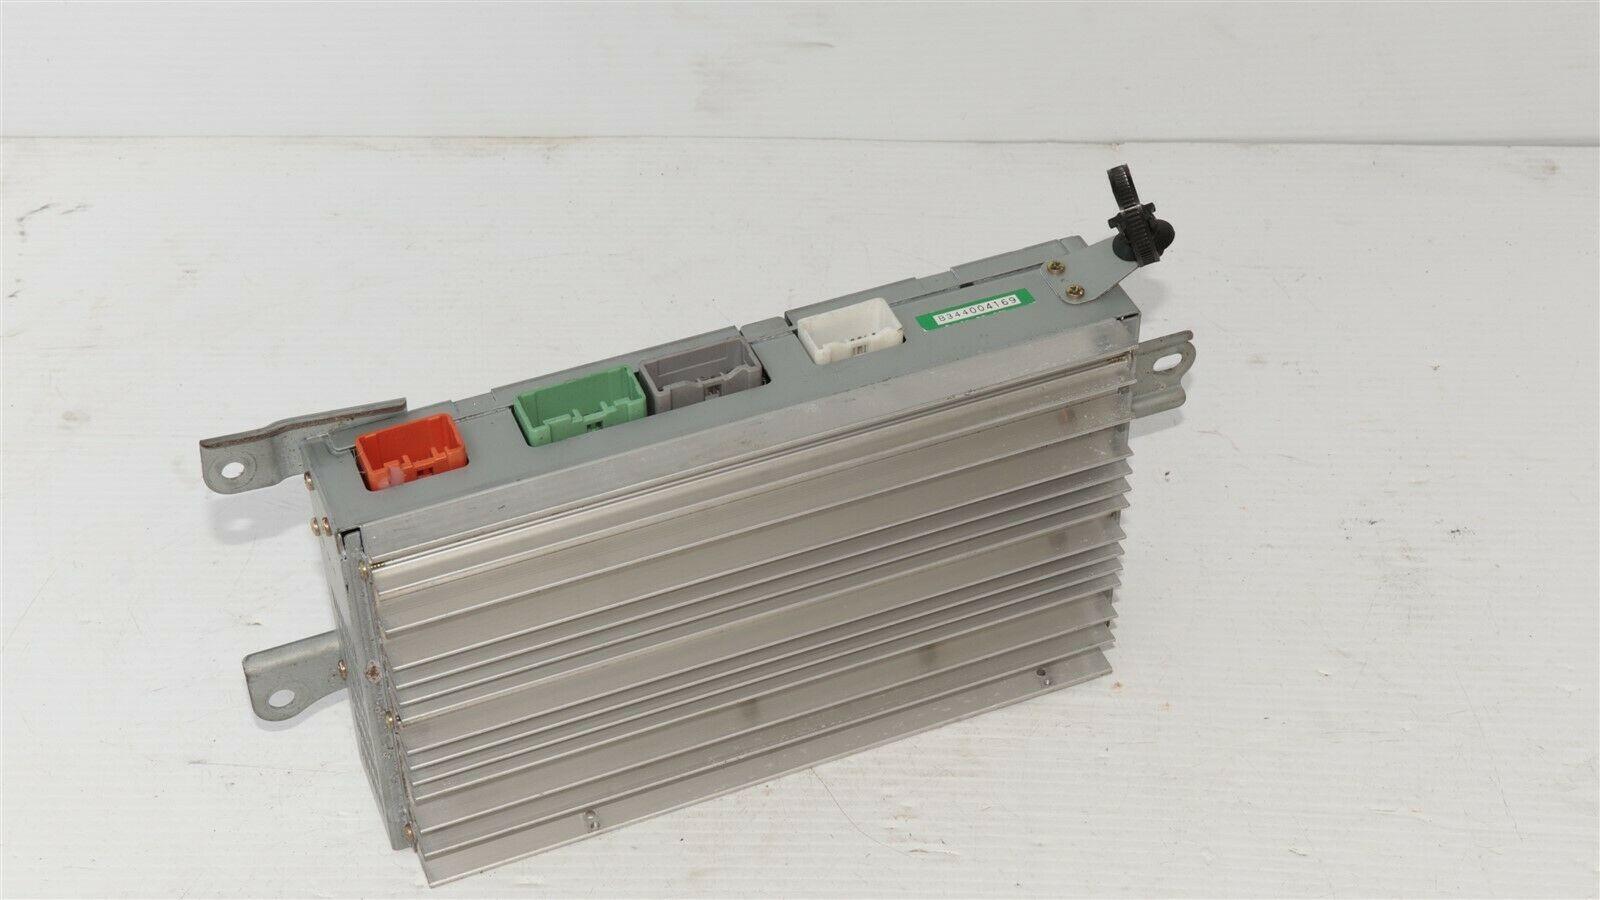 Nakamichi Radio Stereo Amplifier Amp 86280-30380